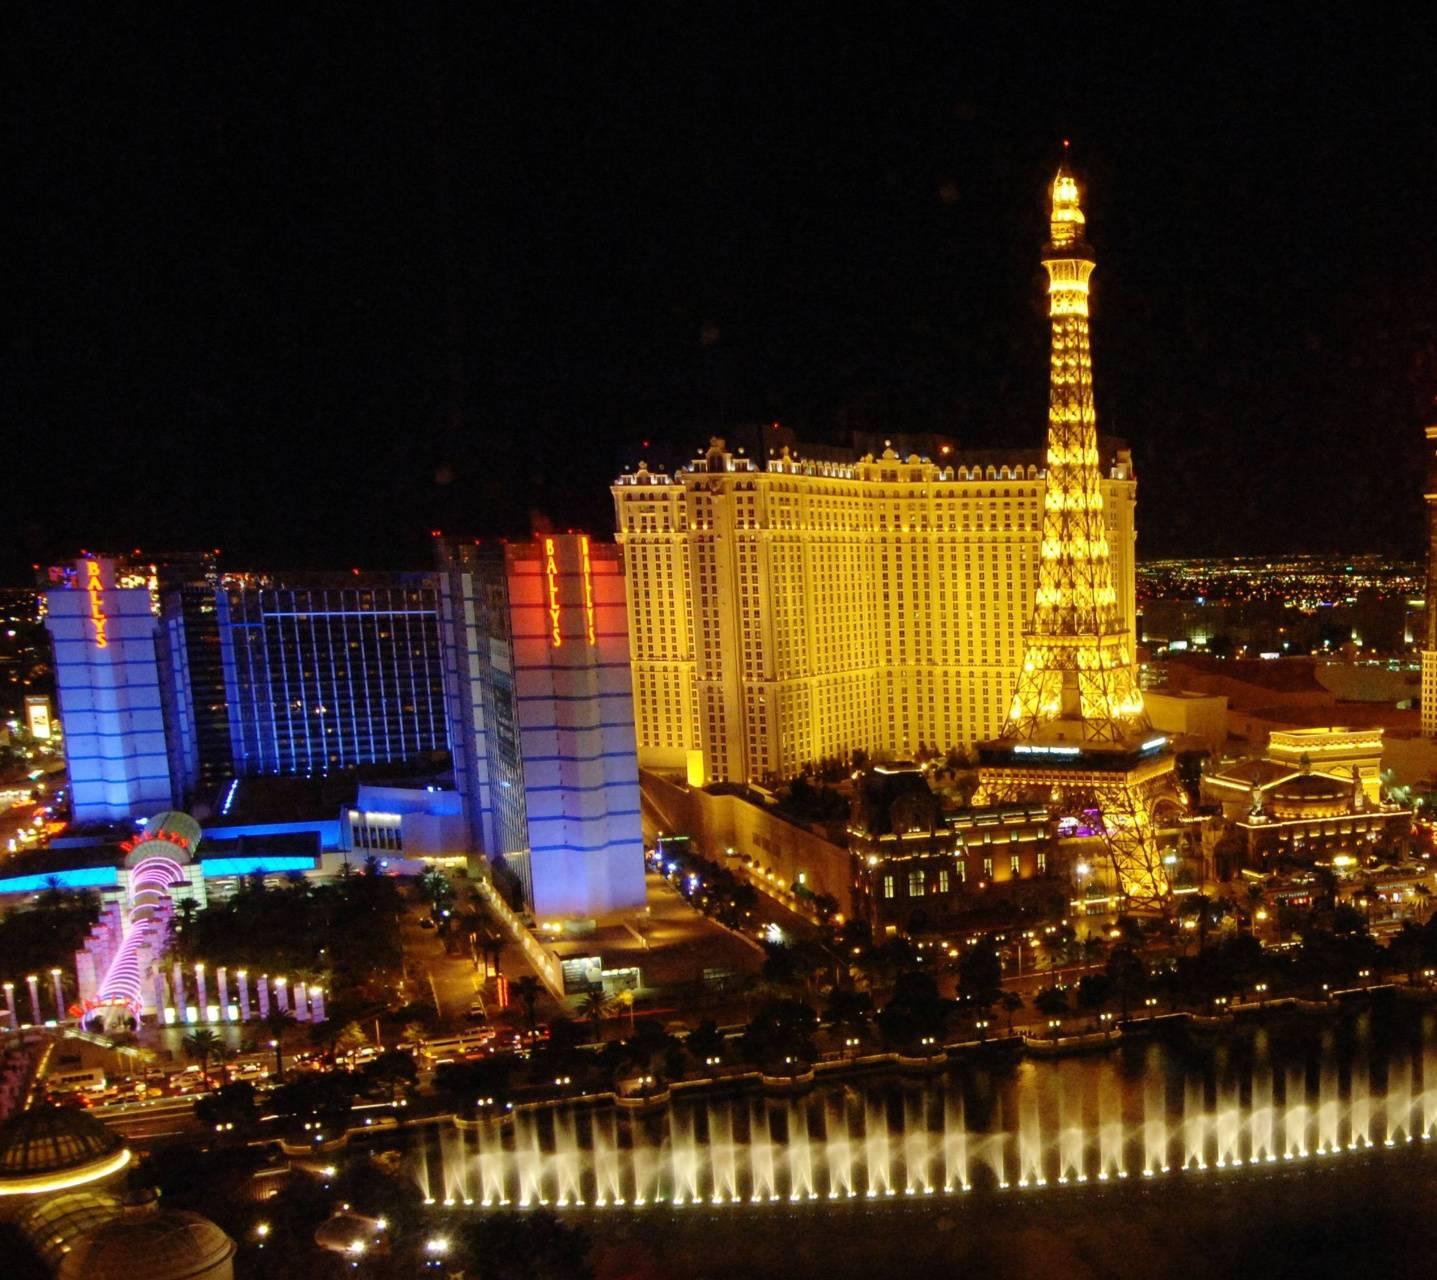 Las Vegas Hd Wallpaper By Im Genesis 48 Free On Zedge